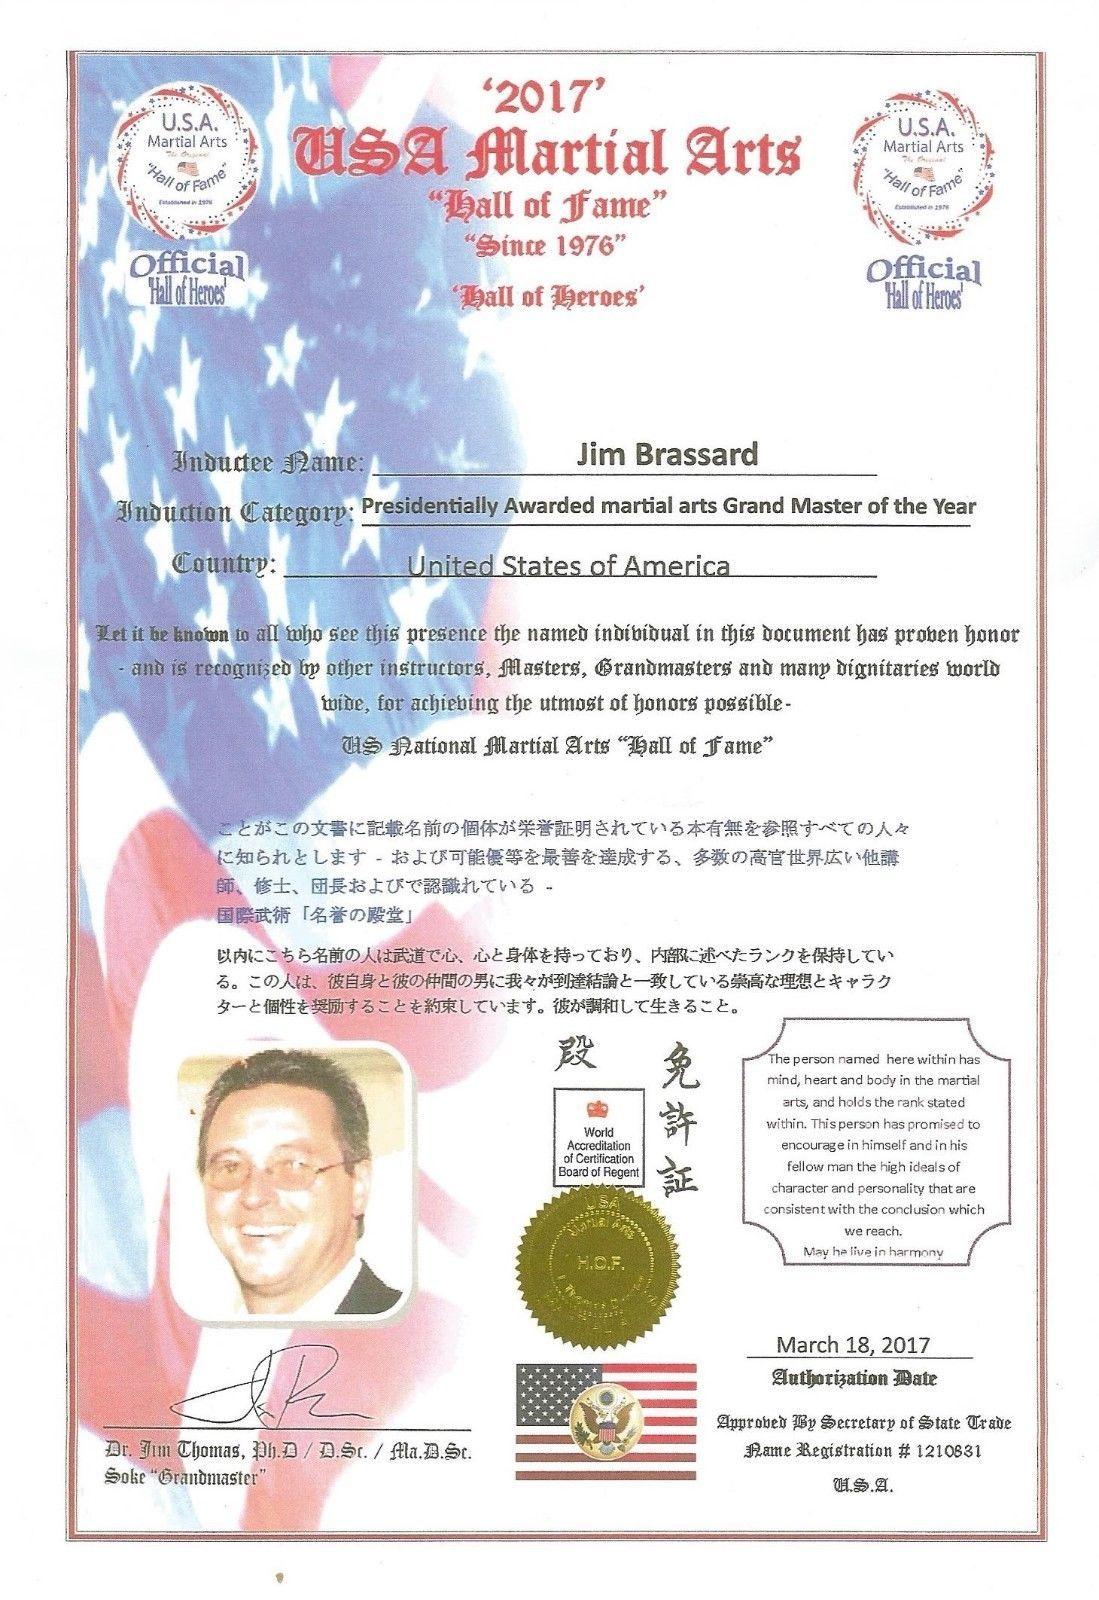 Großzügig Six Sigma Black Belt Zertifikatvorlage Fotos ...